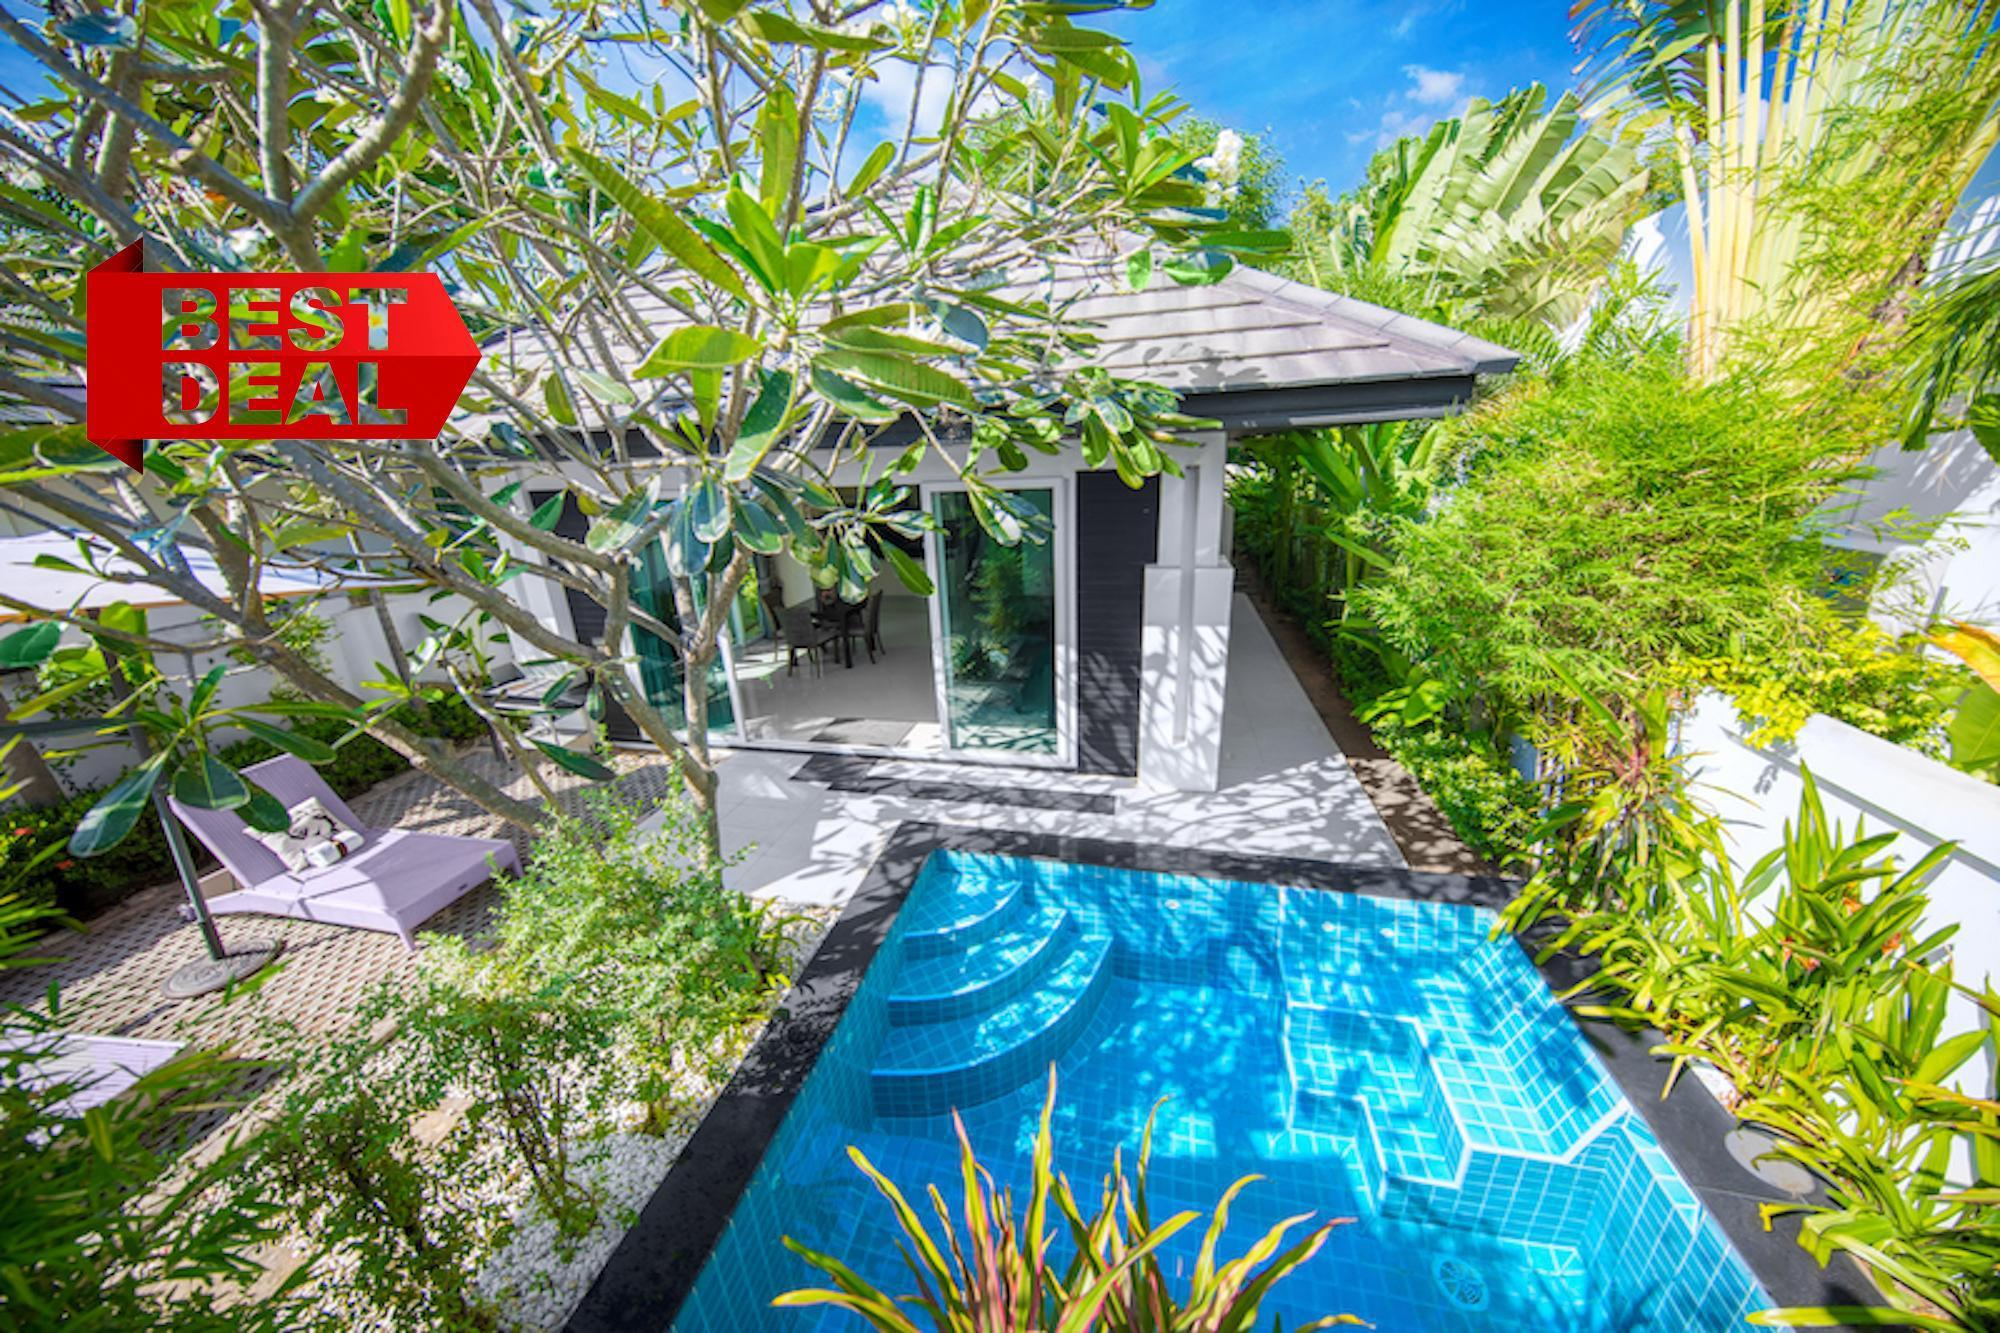 FAMILY Pool  Villa 2 Bedroom Palm Oasis Village 2 ห้องนอน 2 ห้องน้ำส่วนตัว ขนาด 140 ตร.ม. – หาดจอมเทียน